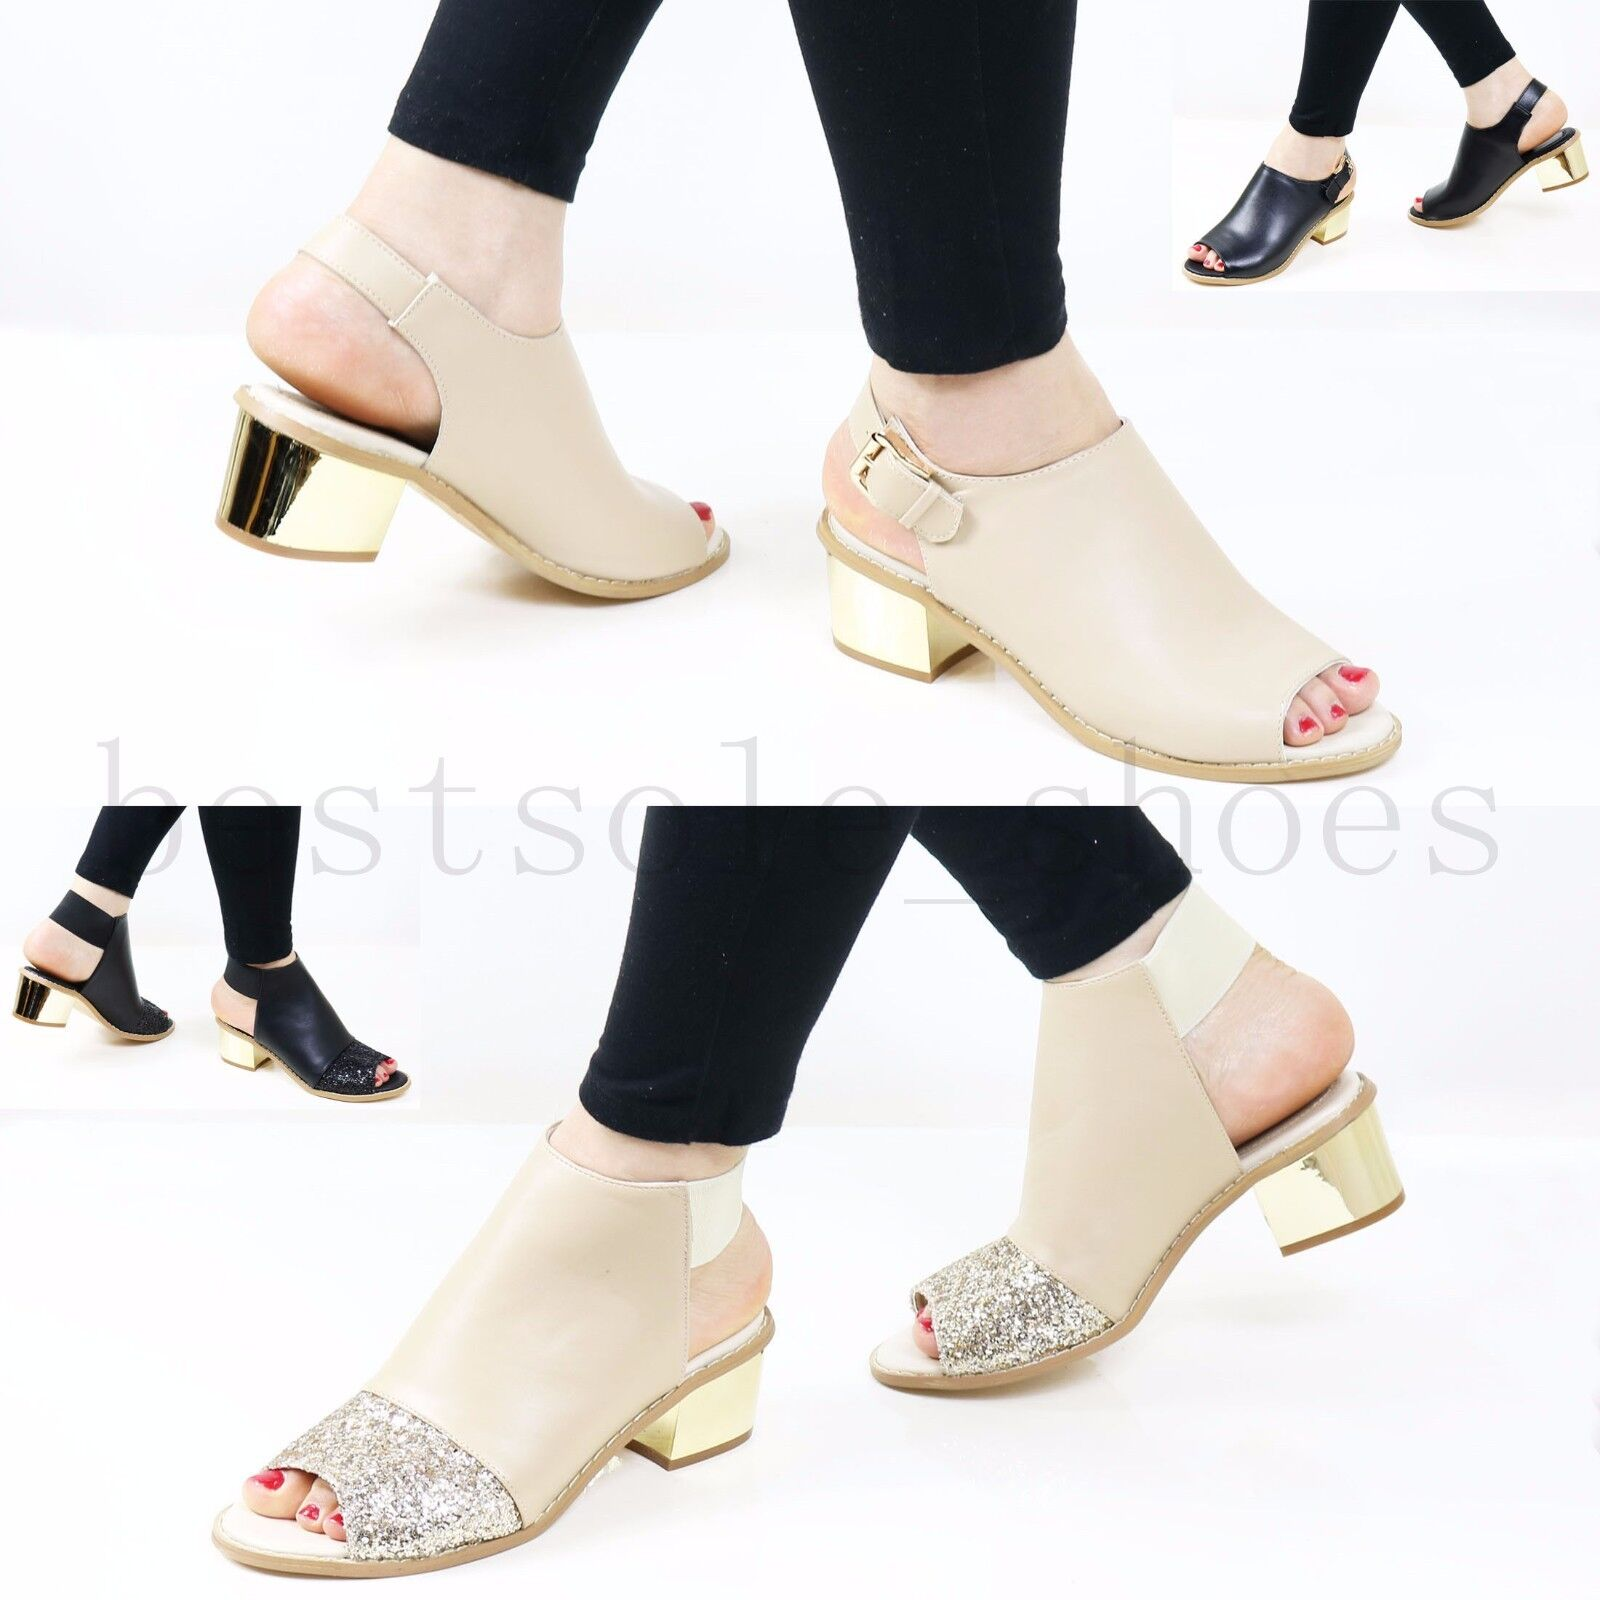 Women Ladies Mid Block Heel Strap Sandals Peep Toe Ankle Strap Heel Comfy Summer Shoes Size 6ba6dc